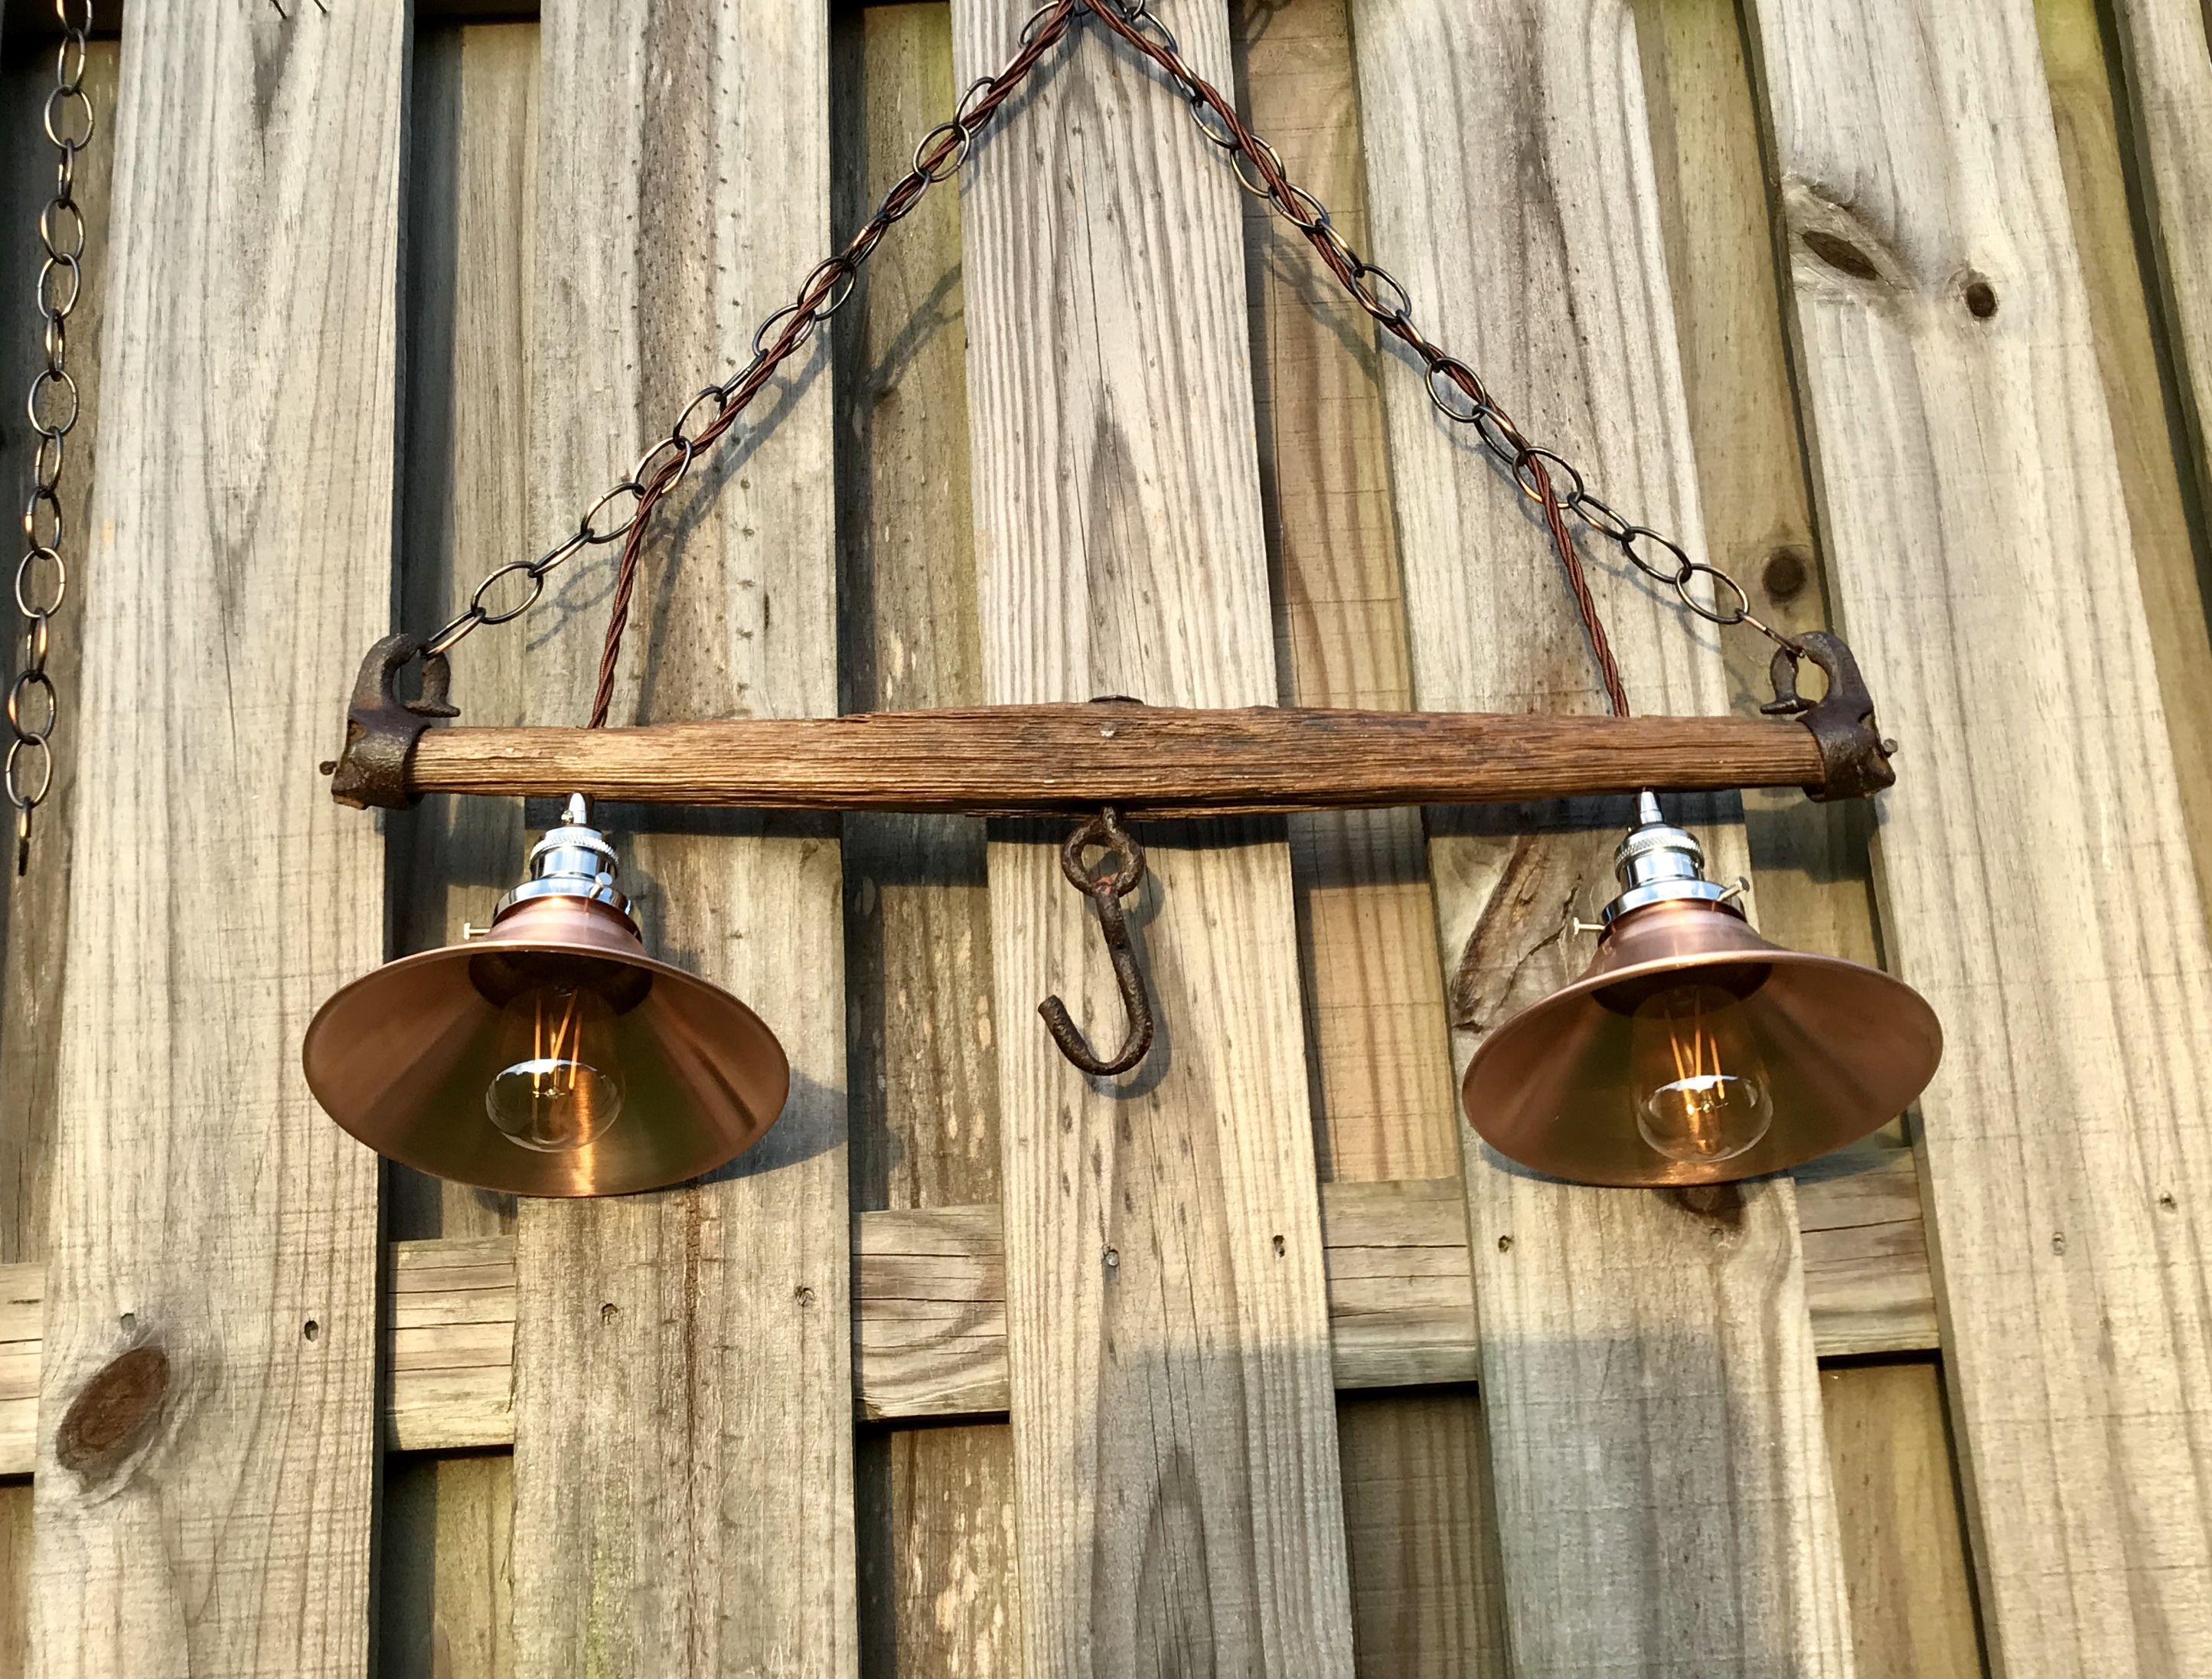 Antique yoke farmhouse style pendant light Farmhouse